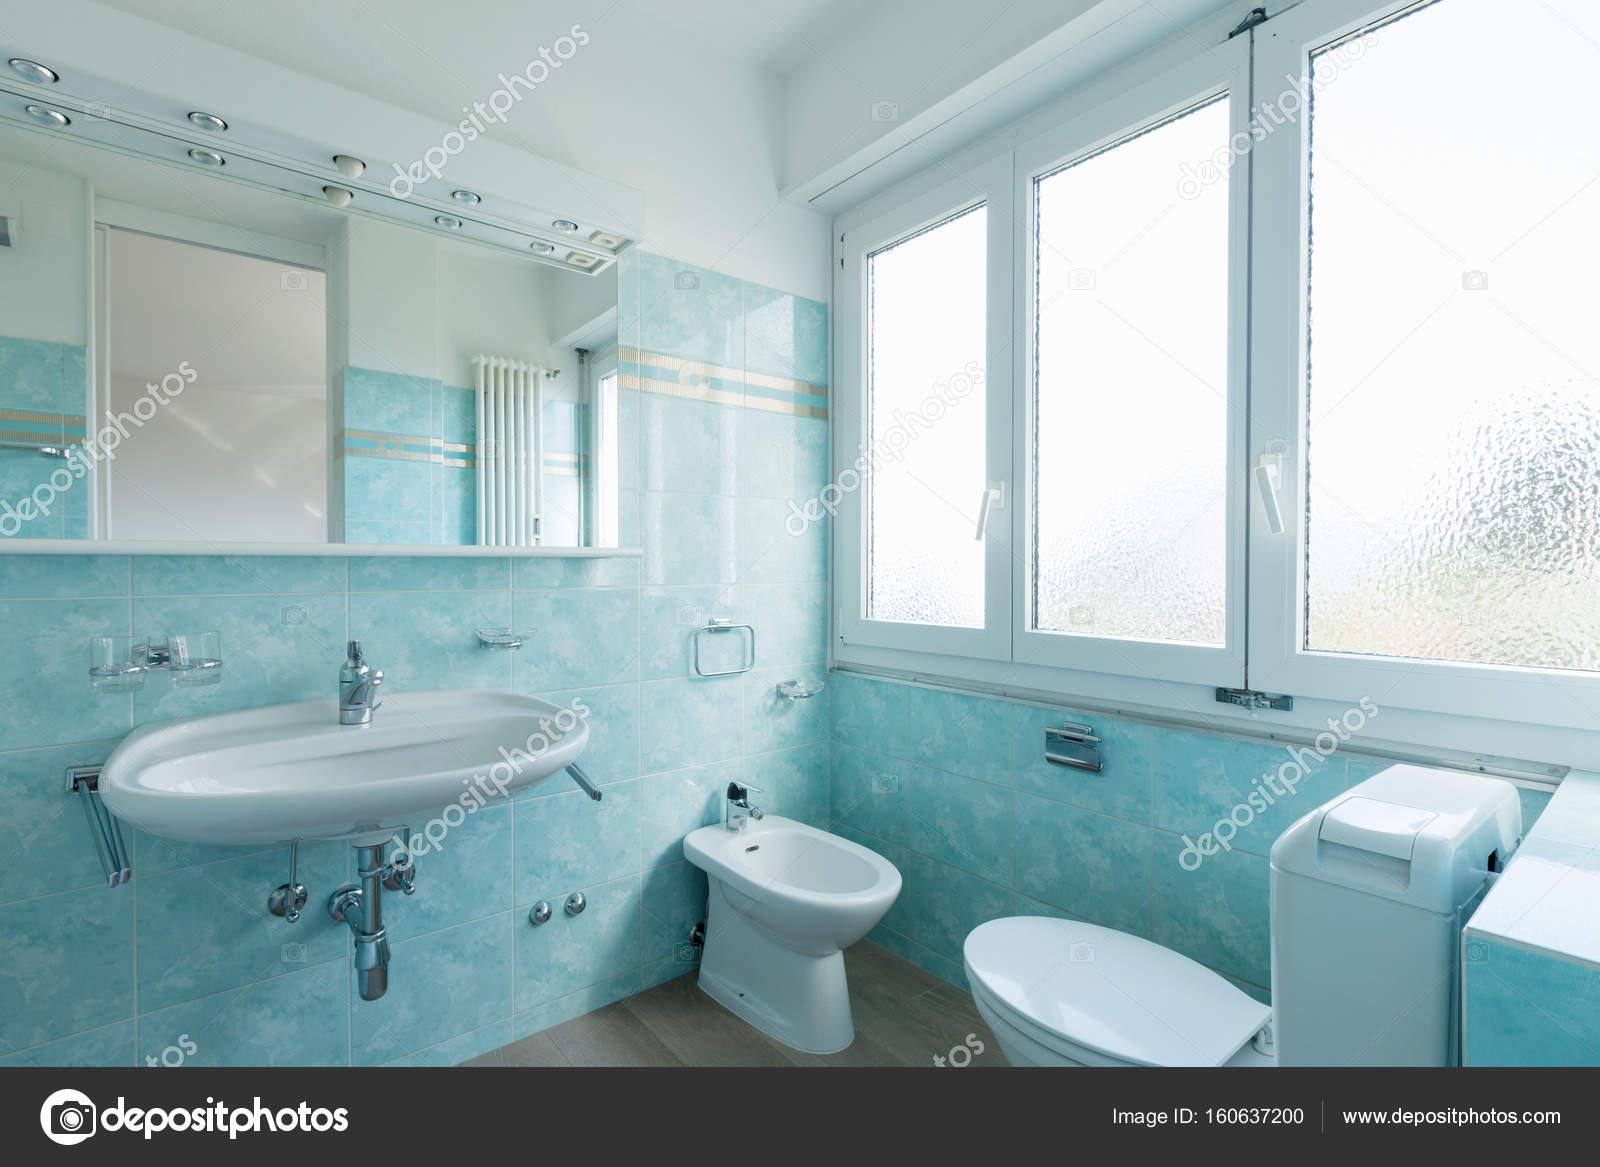 Salle de bain Vintage bleu — Photographie Zveiger © #160637200